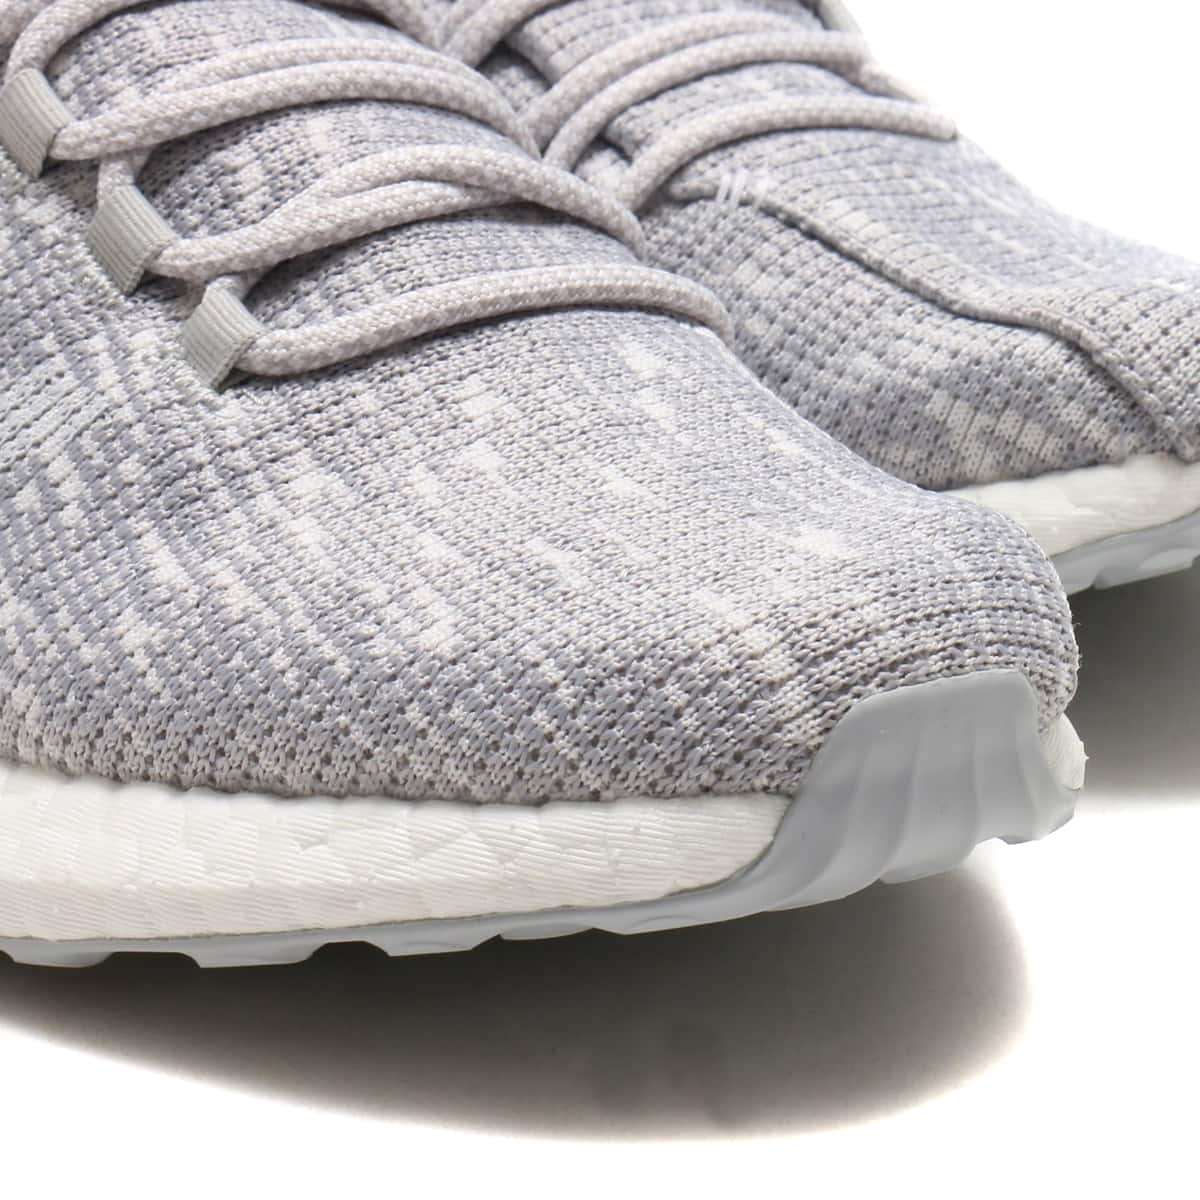 b62d6763c adidas PureBOOST LTD Running White Running White Blue 18SS-I